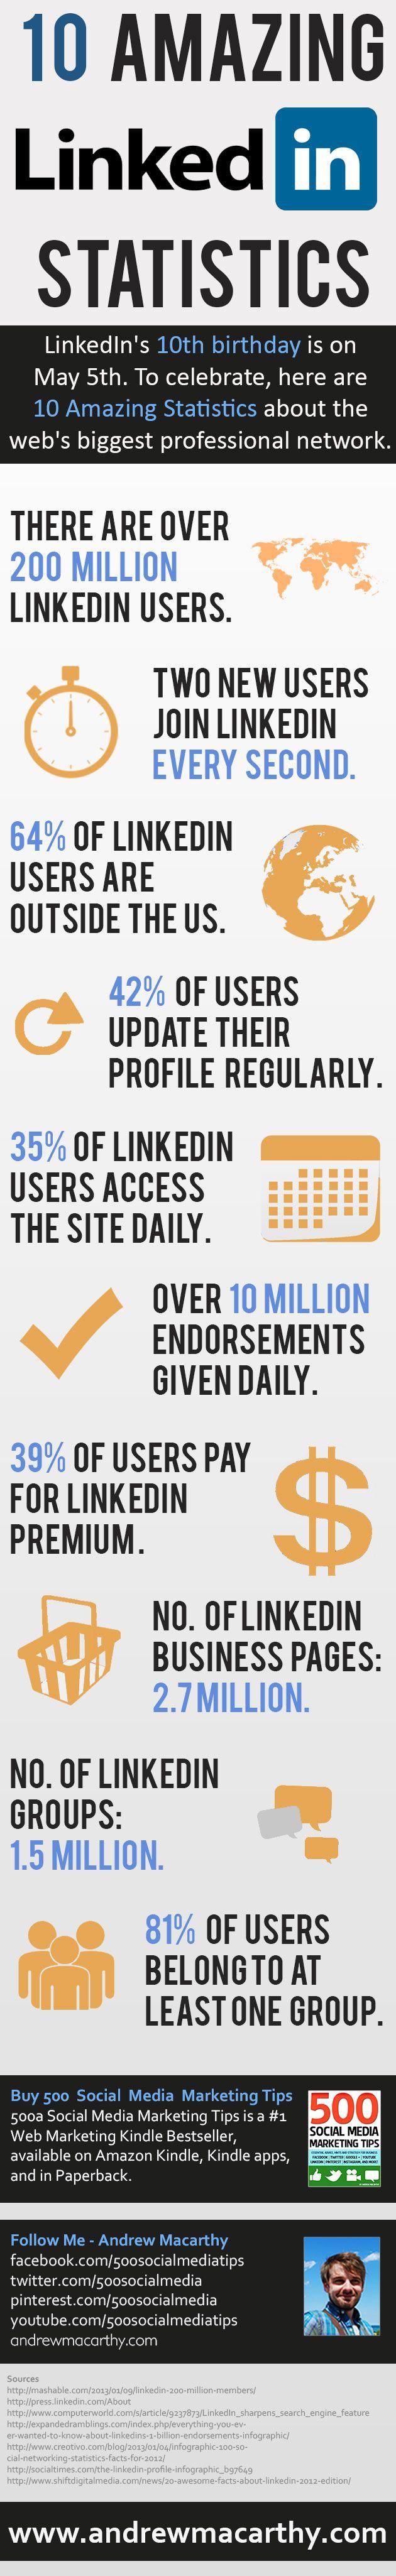 LinkedIn celebrates its 10th birthday on May 5th, 2013. Here are 10 Amazing LinkedIn Statistics to celebrate this milestone!